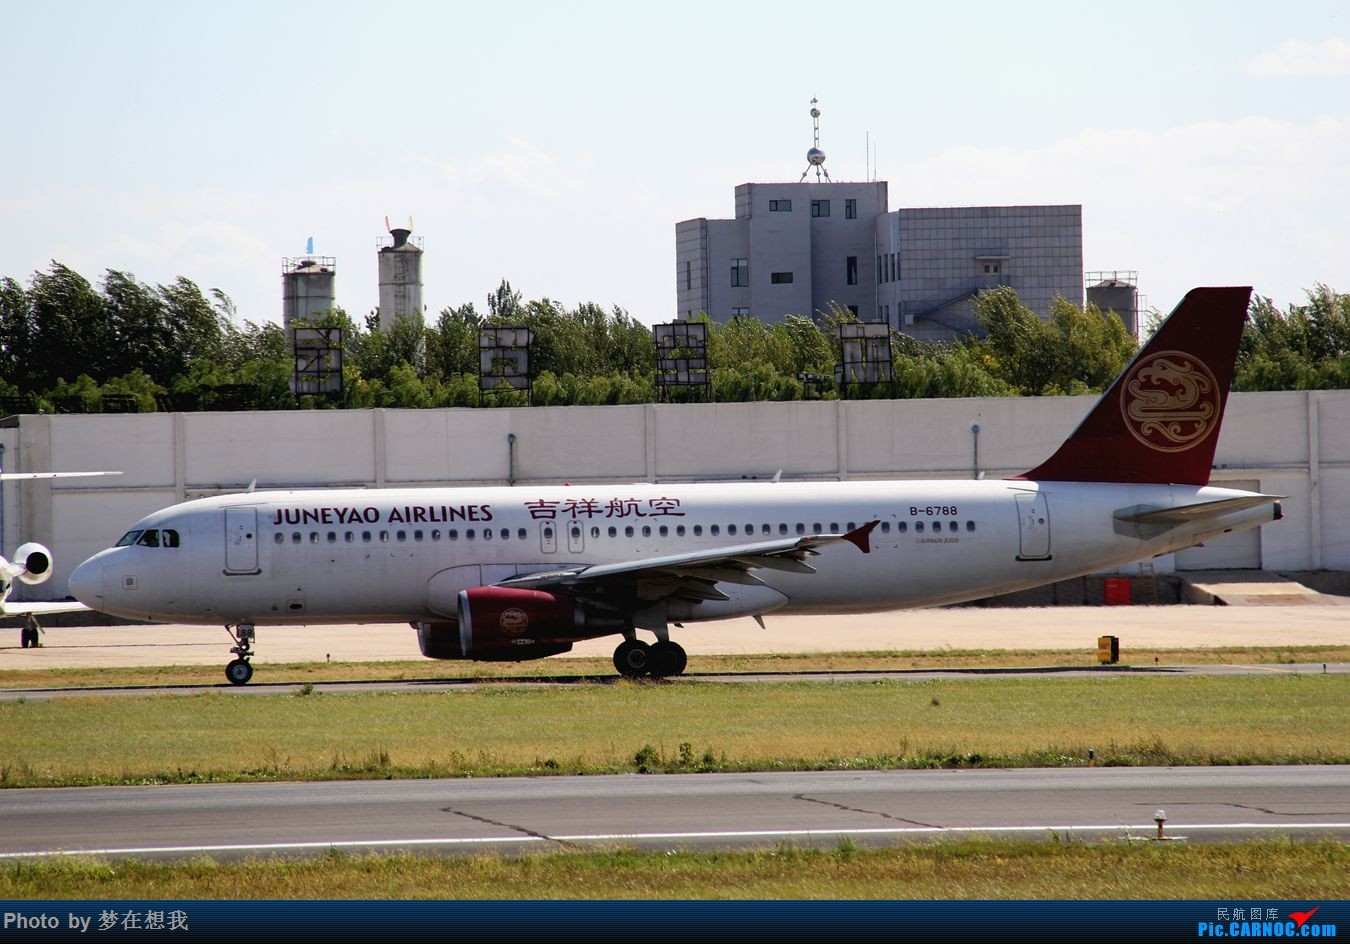 Re:[原创]十月二号高中党坐动车从丹东到沈阳拍机SHE AIRBUS A320-200 B-6788 中国沈阳桃仙国际机场